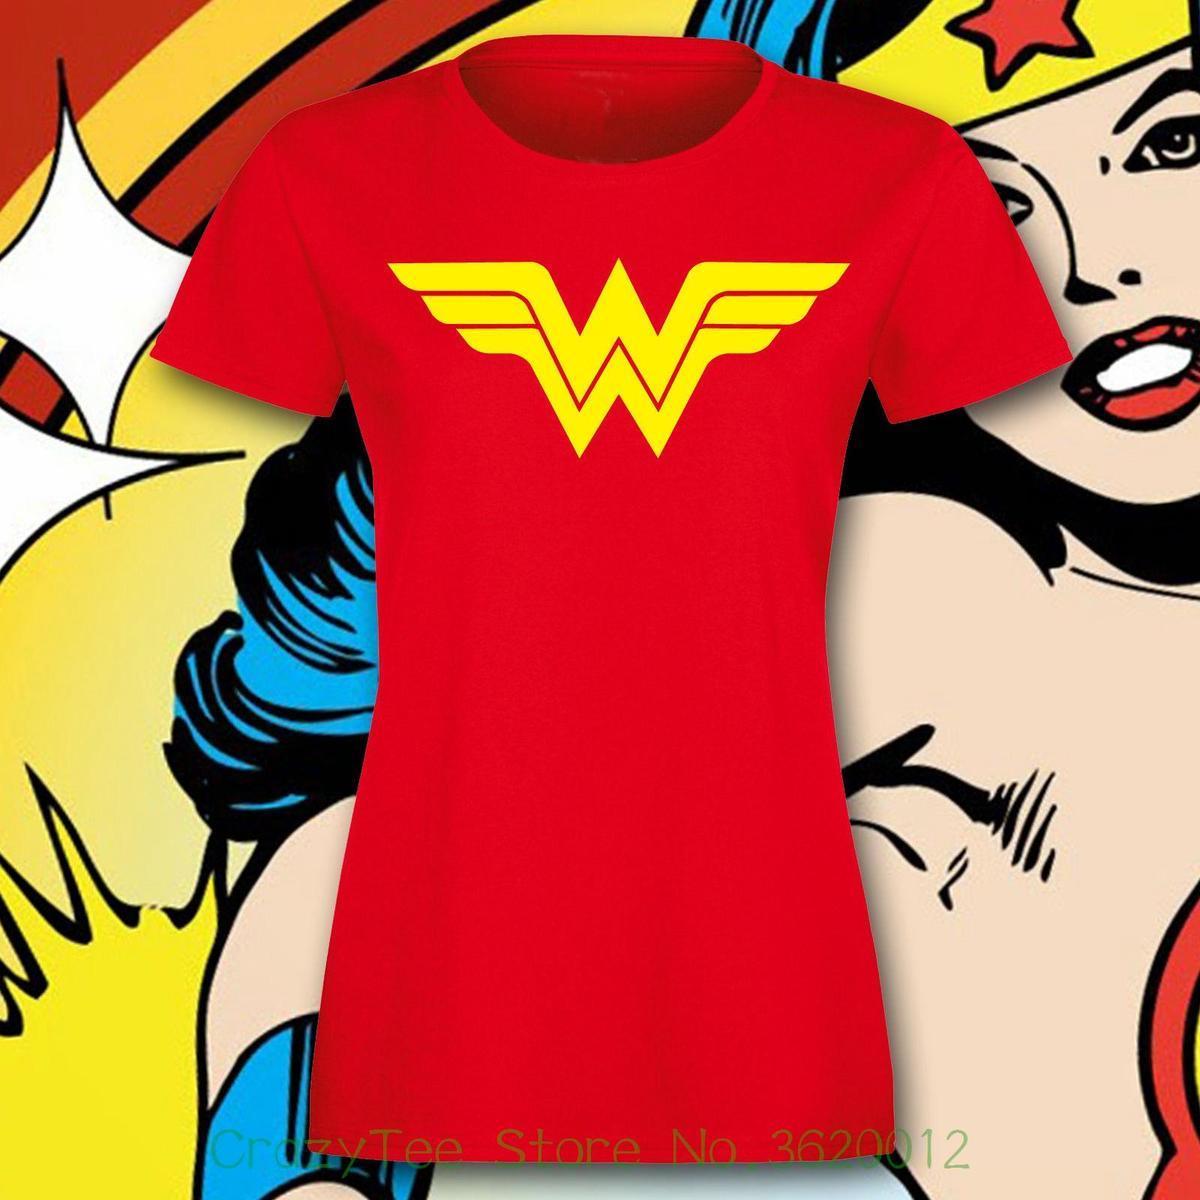 Para Maravilla Harajuku Camisa Equipada Camiseta Manga Mujer Superhéroe Retro S Party Cool 2xl Corta Top De Costume ZXiuPOk